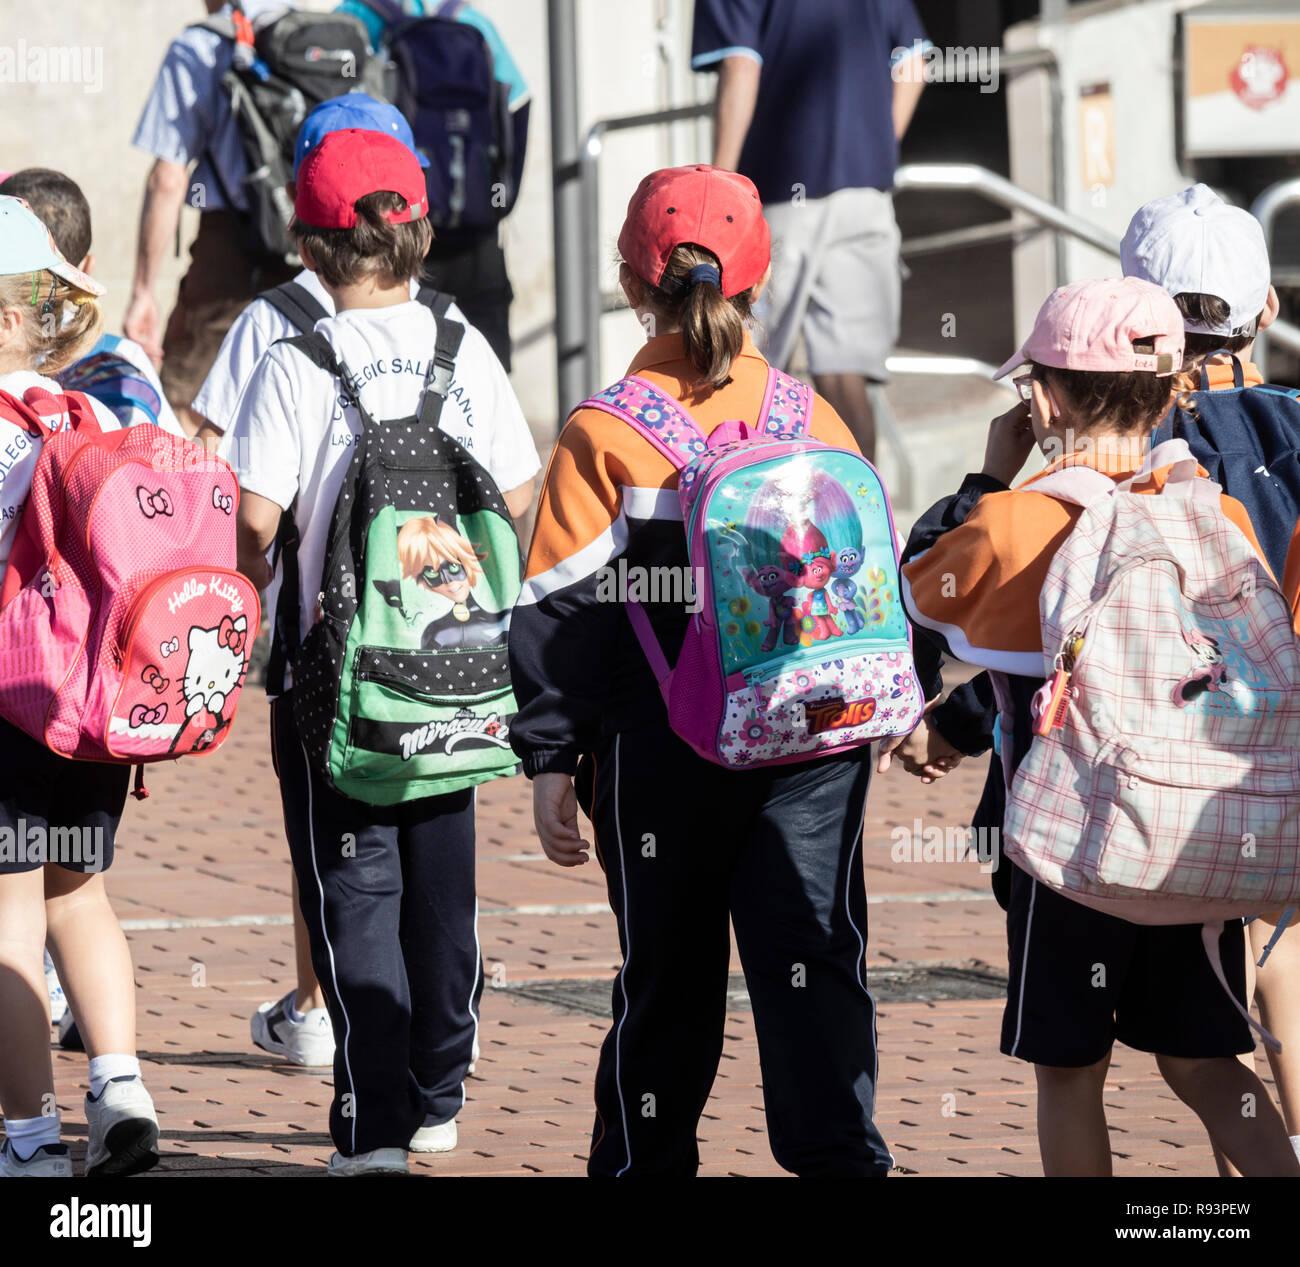 Spanish schoolchildren with large backpacks - Stock Image